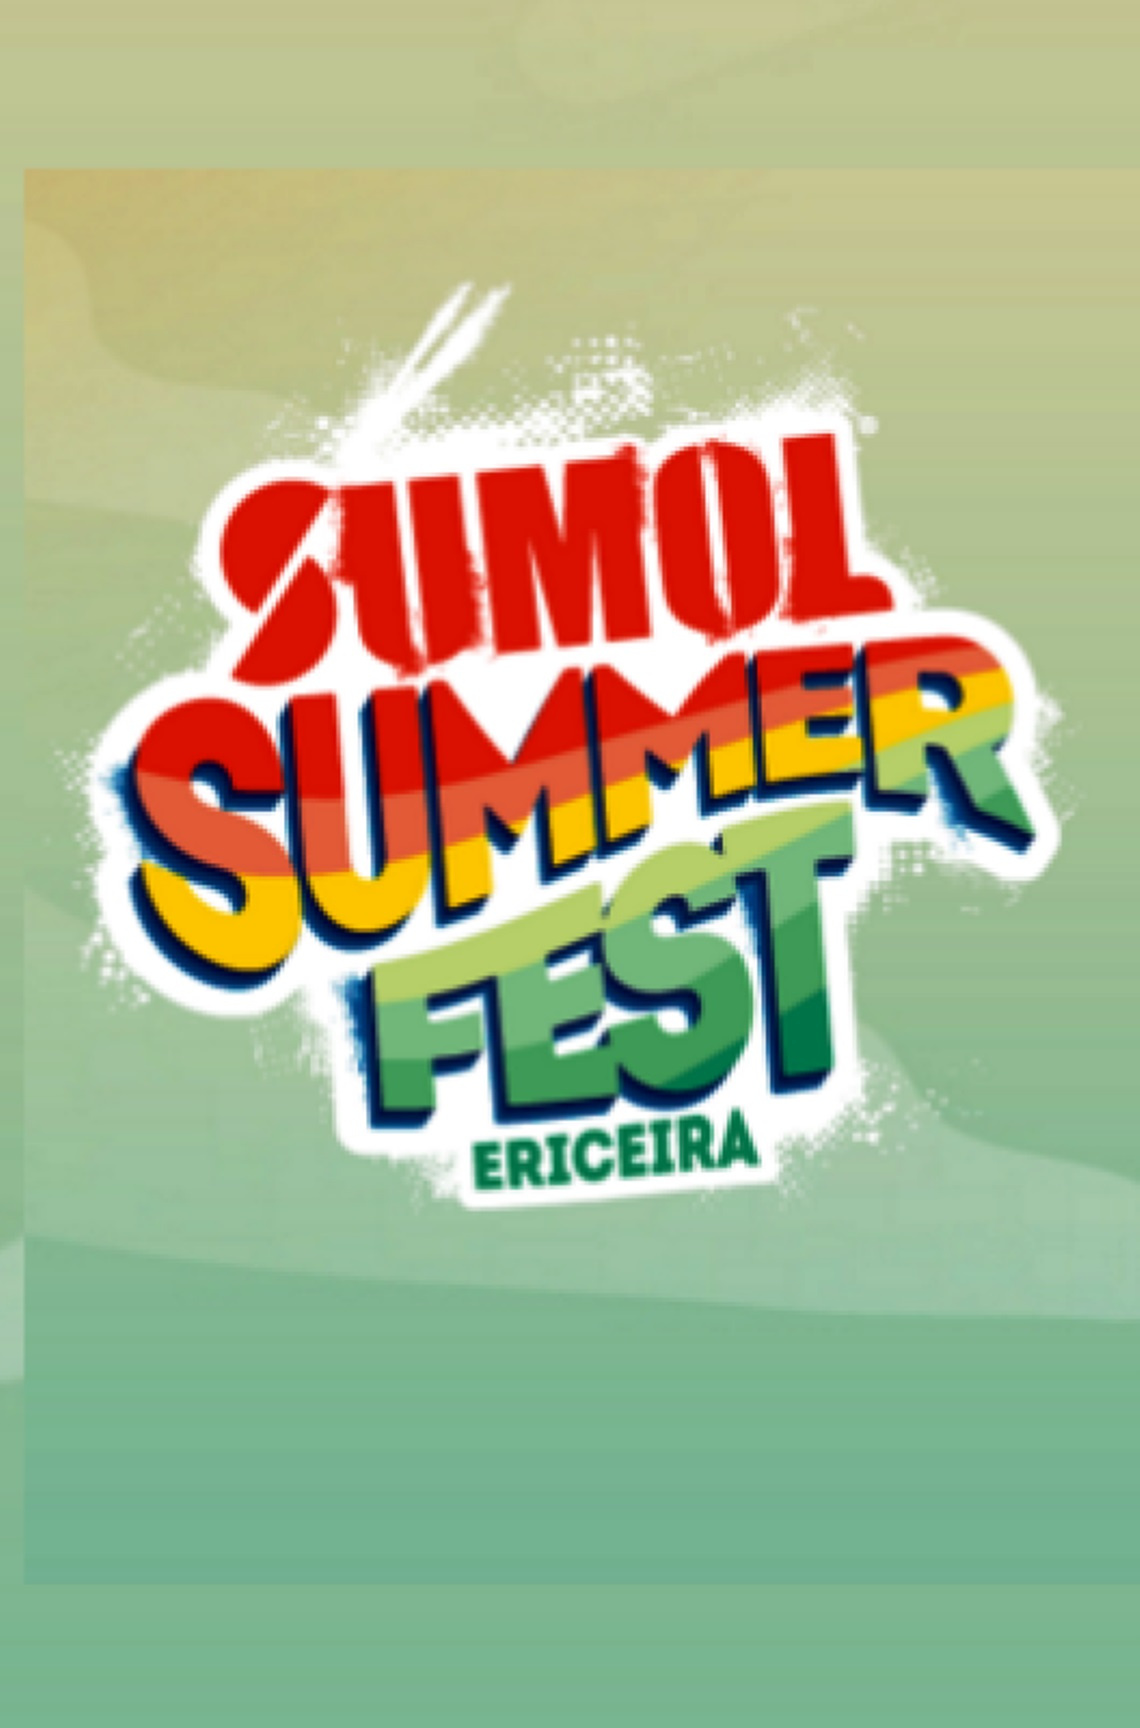 Sumol Summer Fest: Ganhe convites duplos